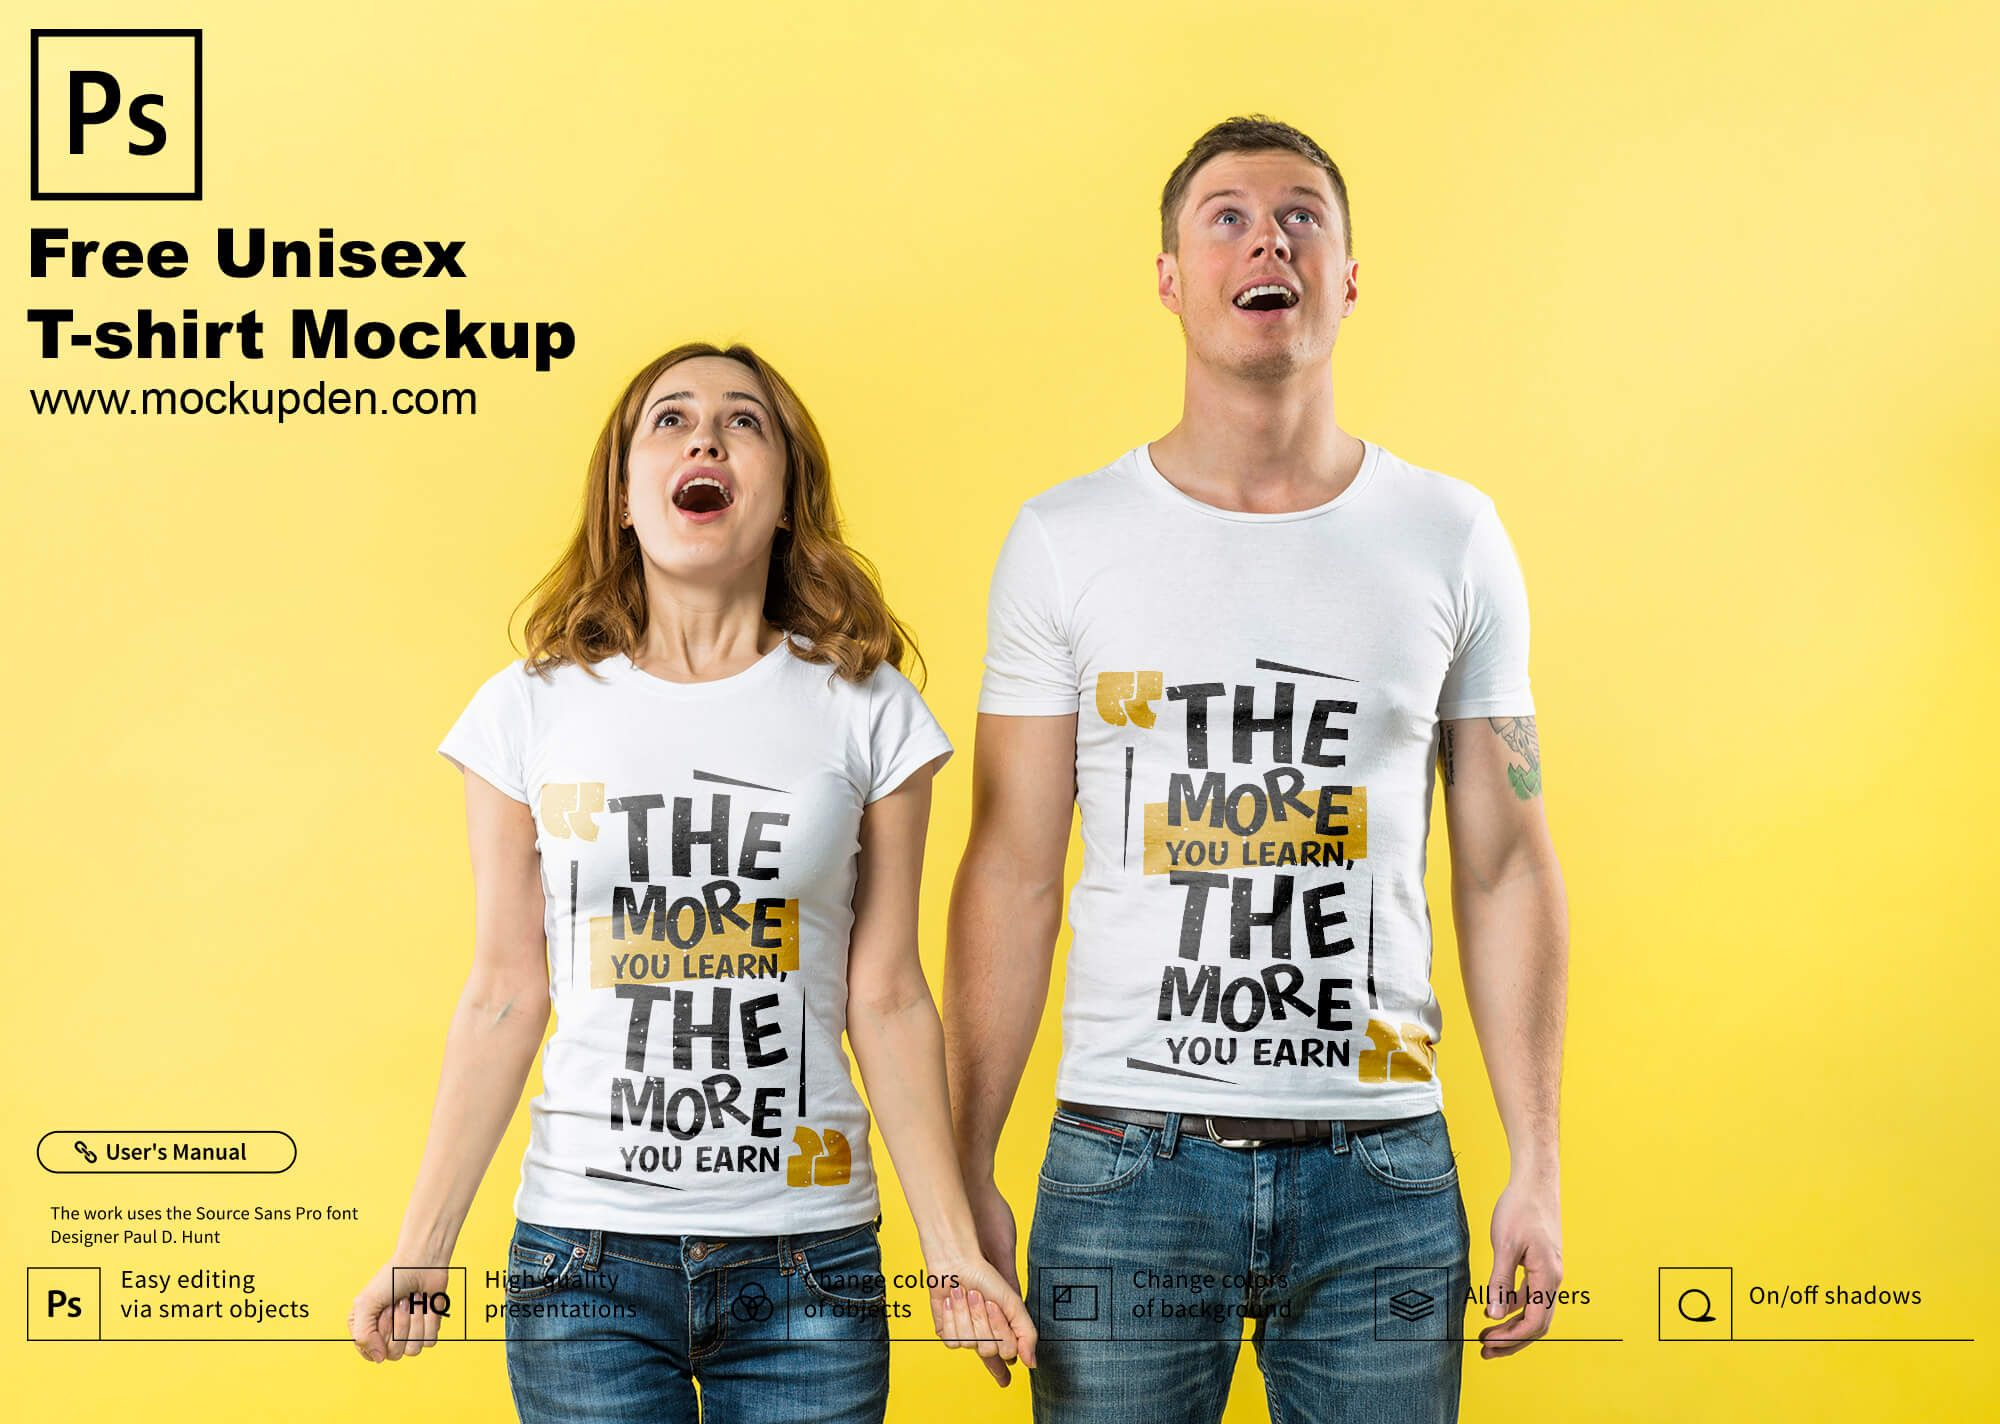 Download Free Unisex T Shirt Mockup Psd Template Shirt Mockup Tshirt Mockup Hoodie Mockup